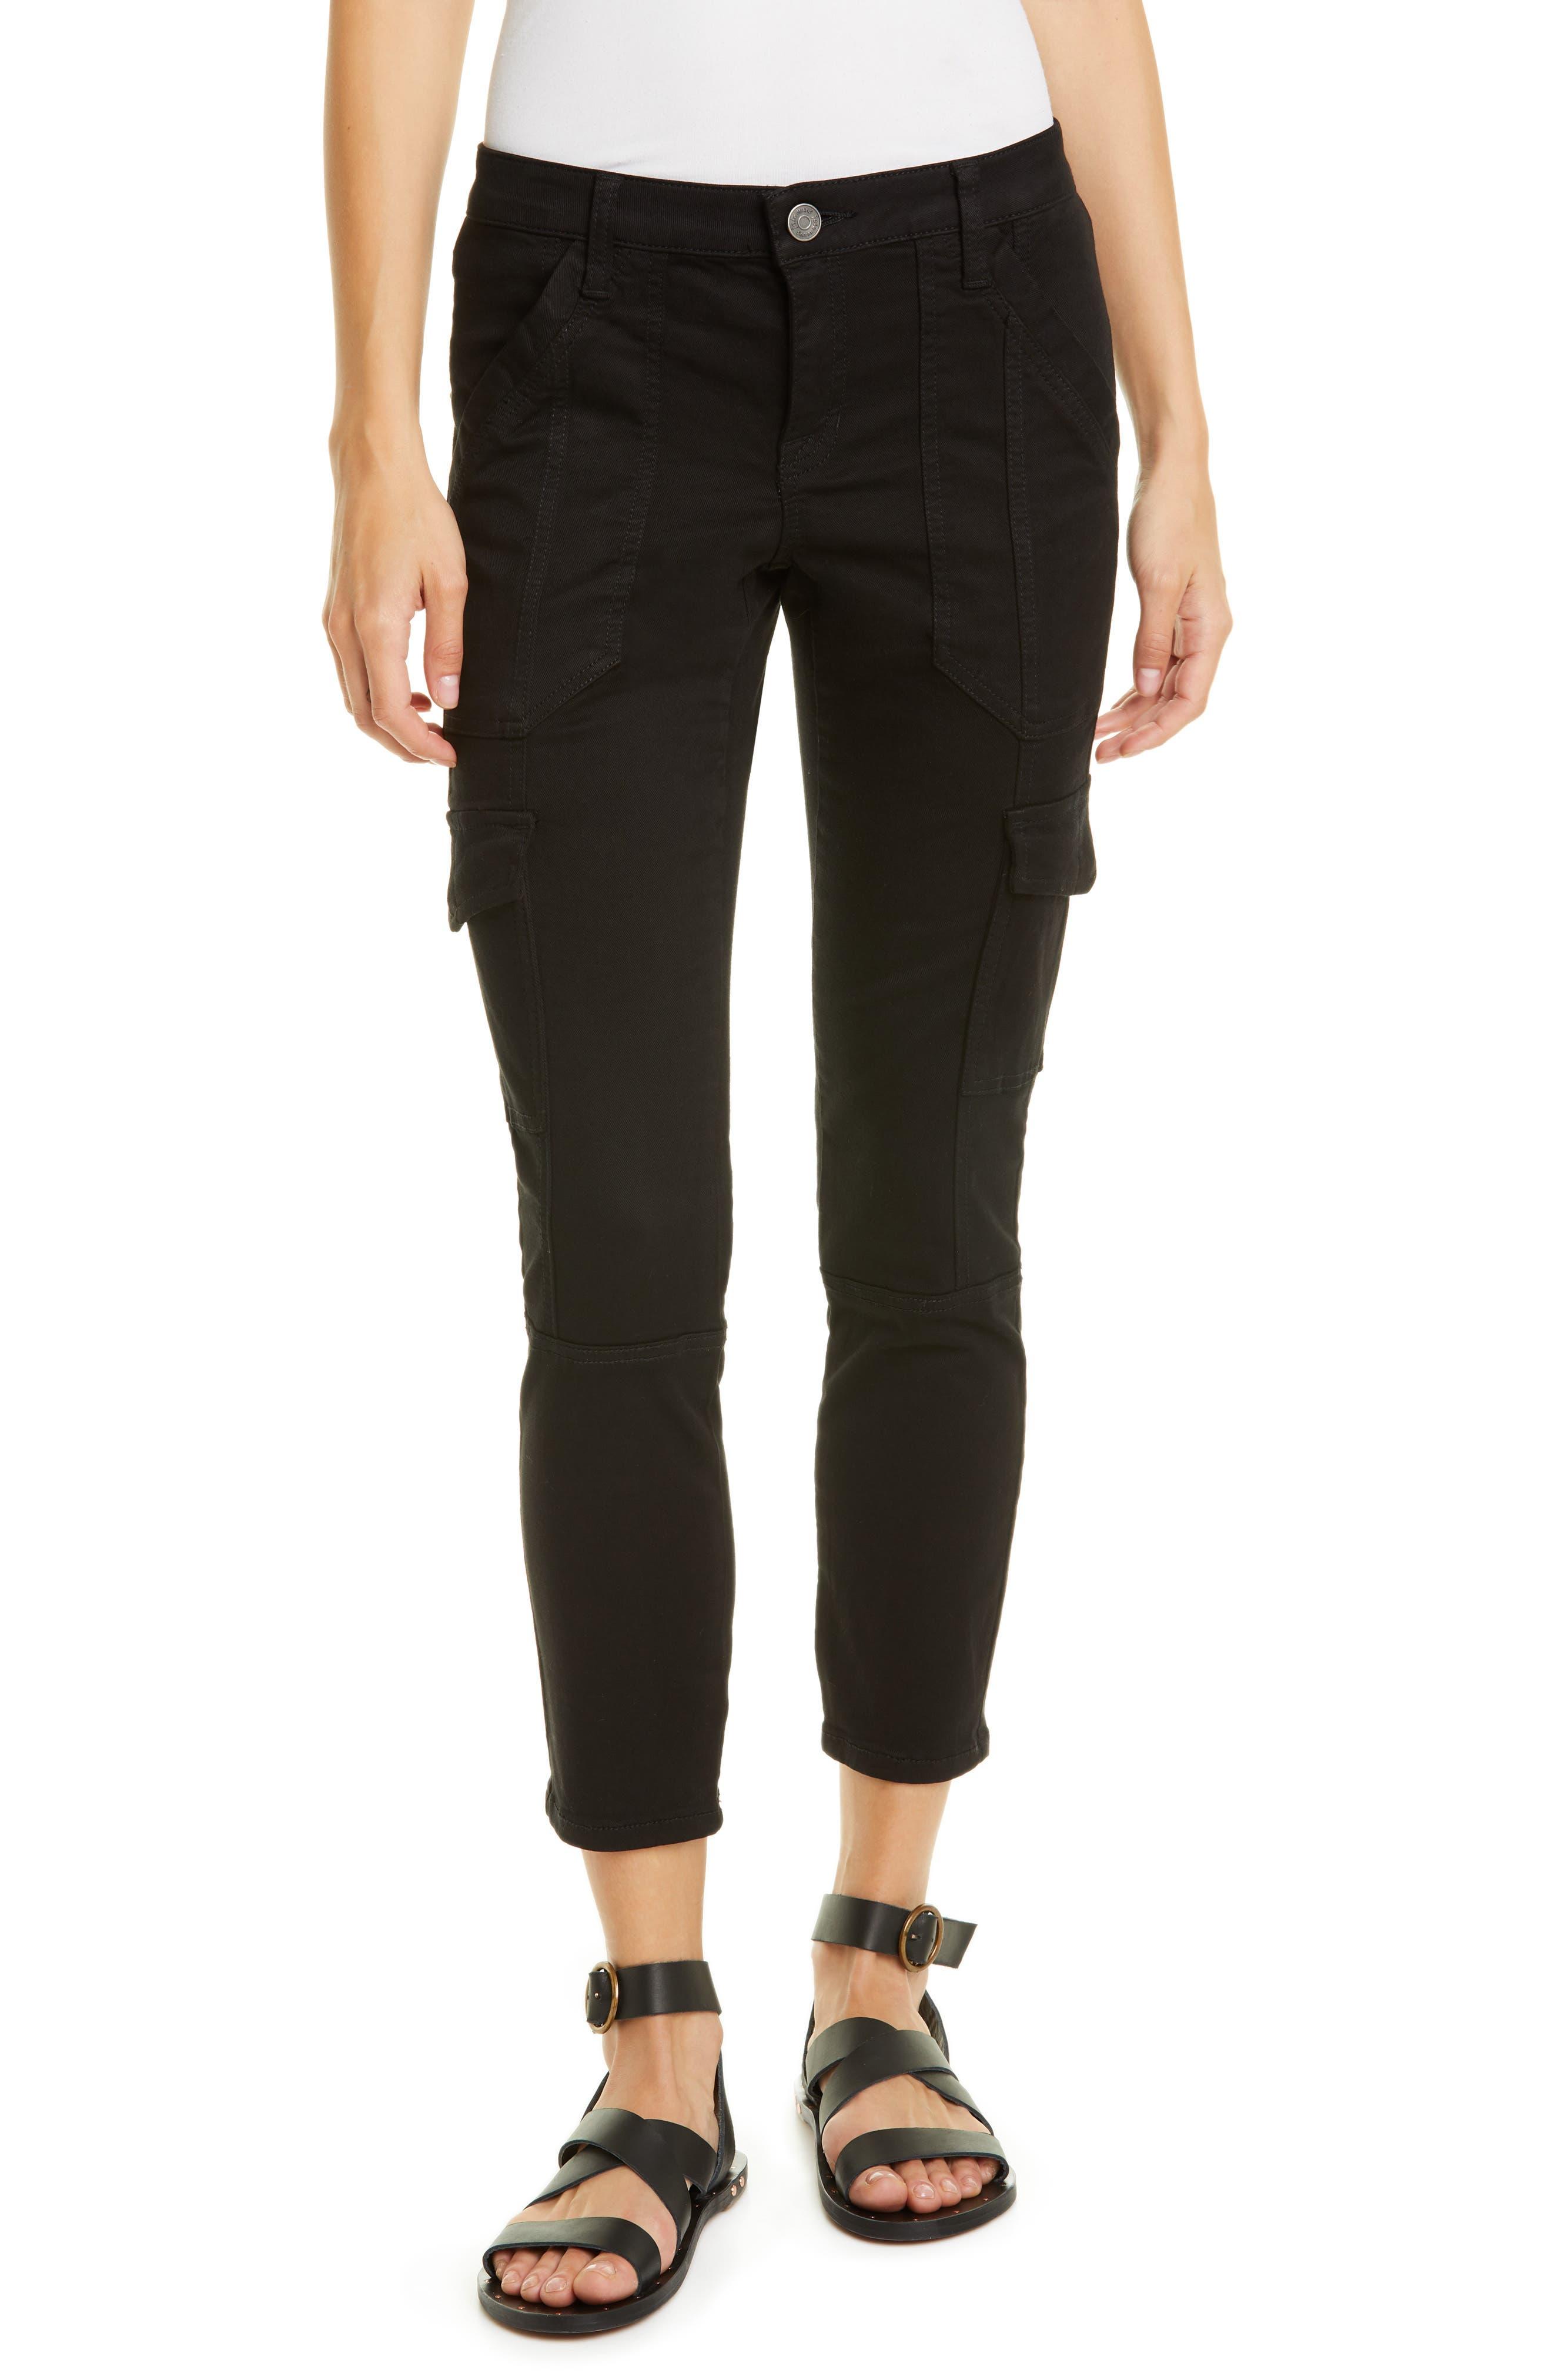 Joie Okana Skinny Cargo Pants, Black